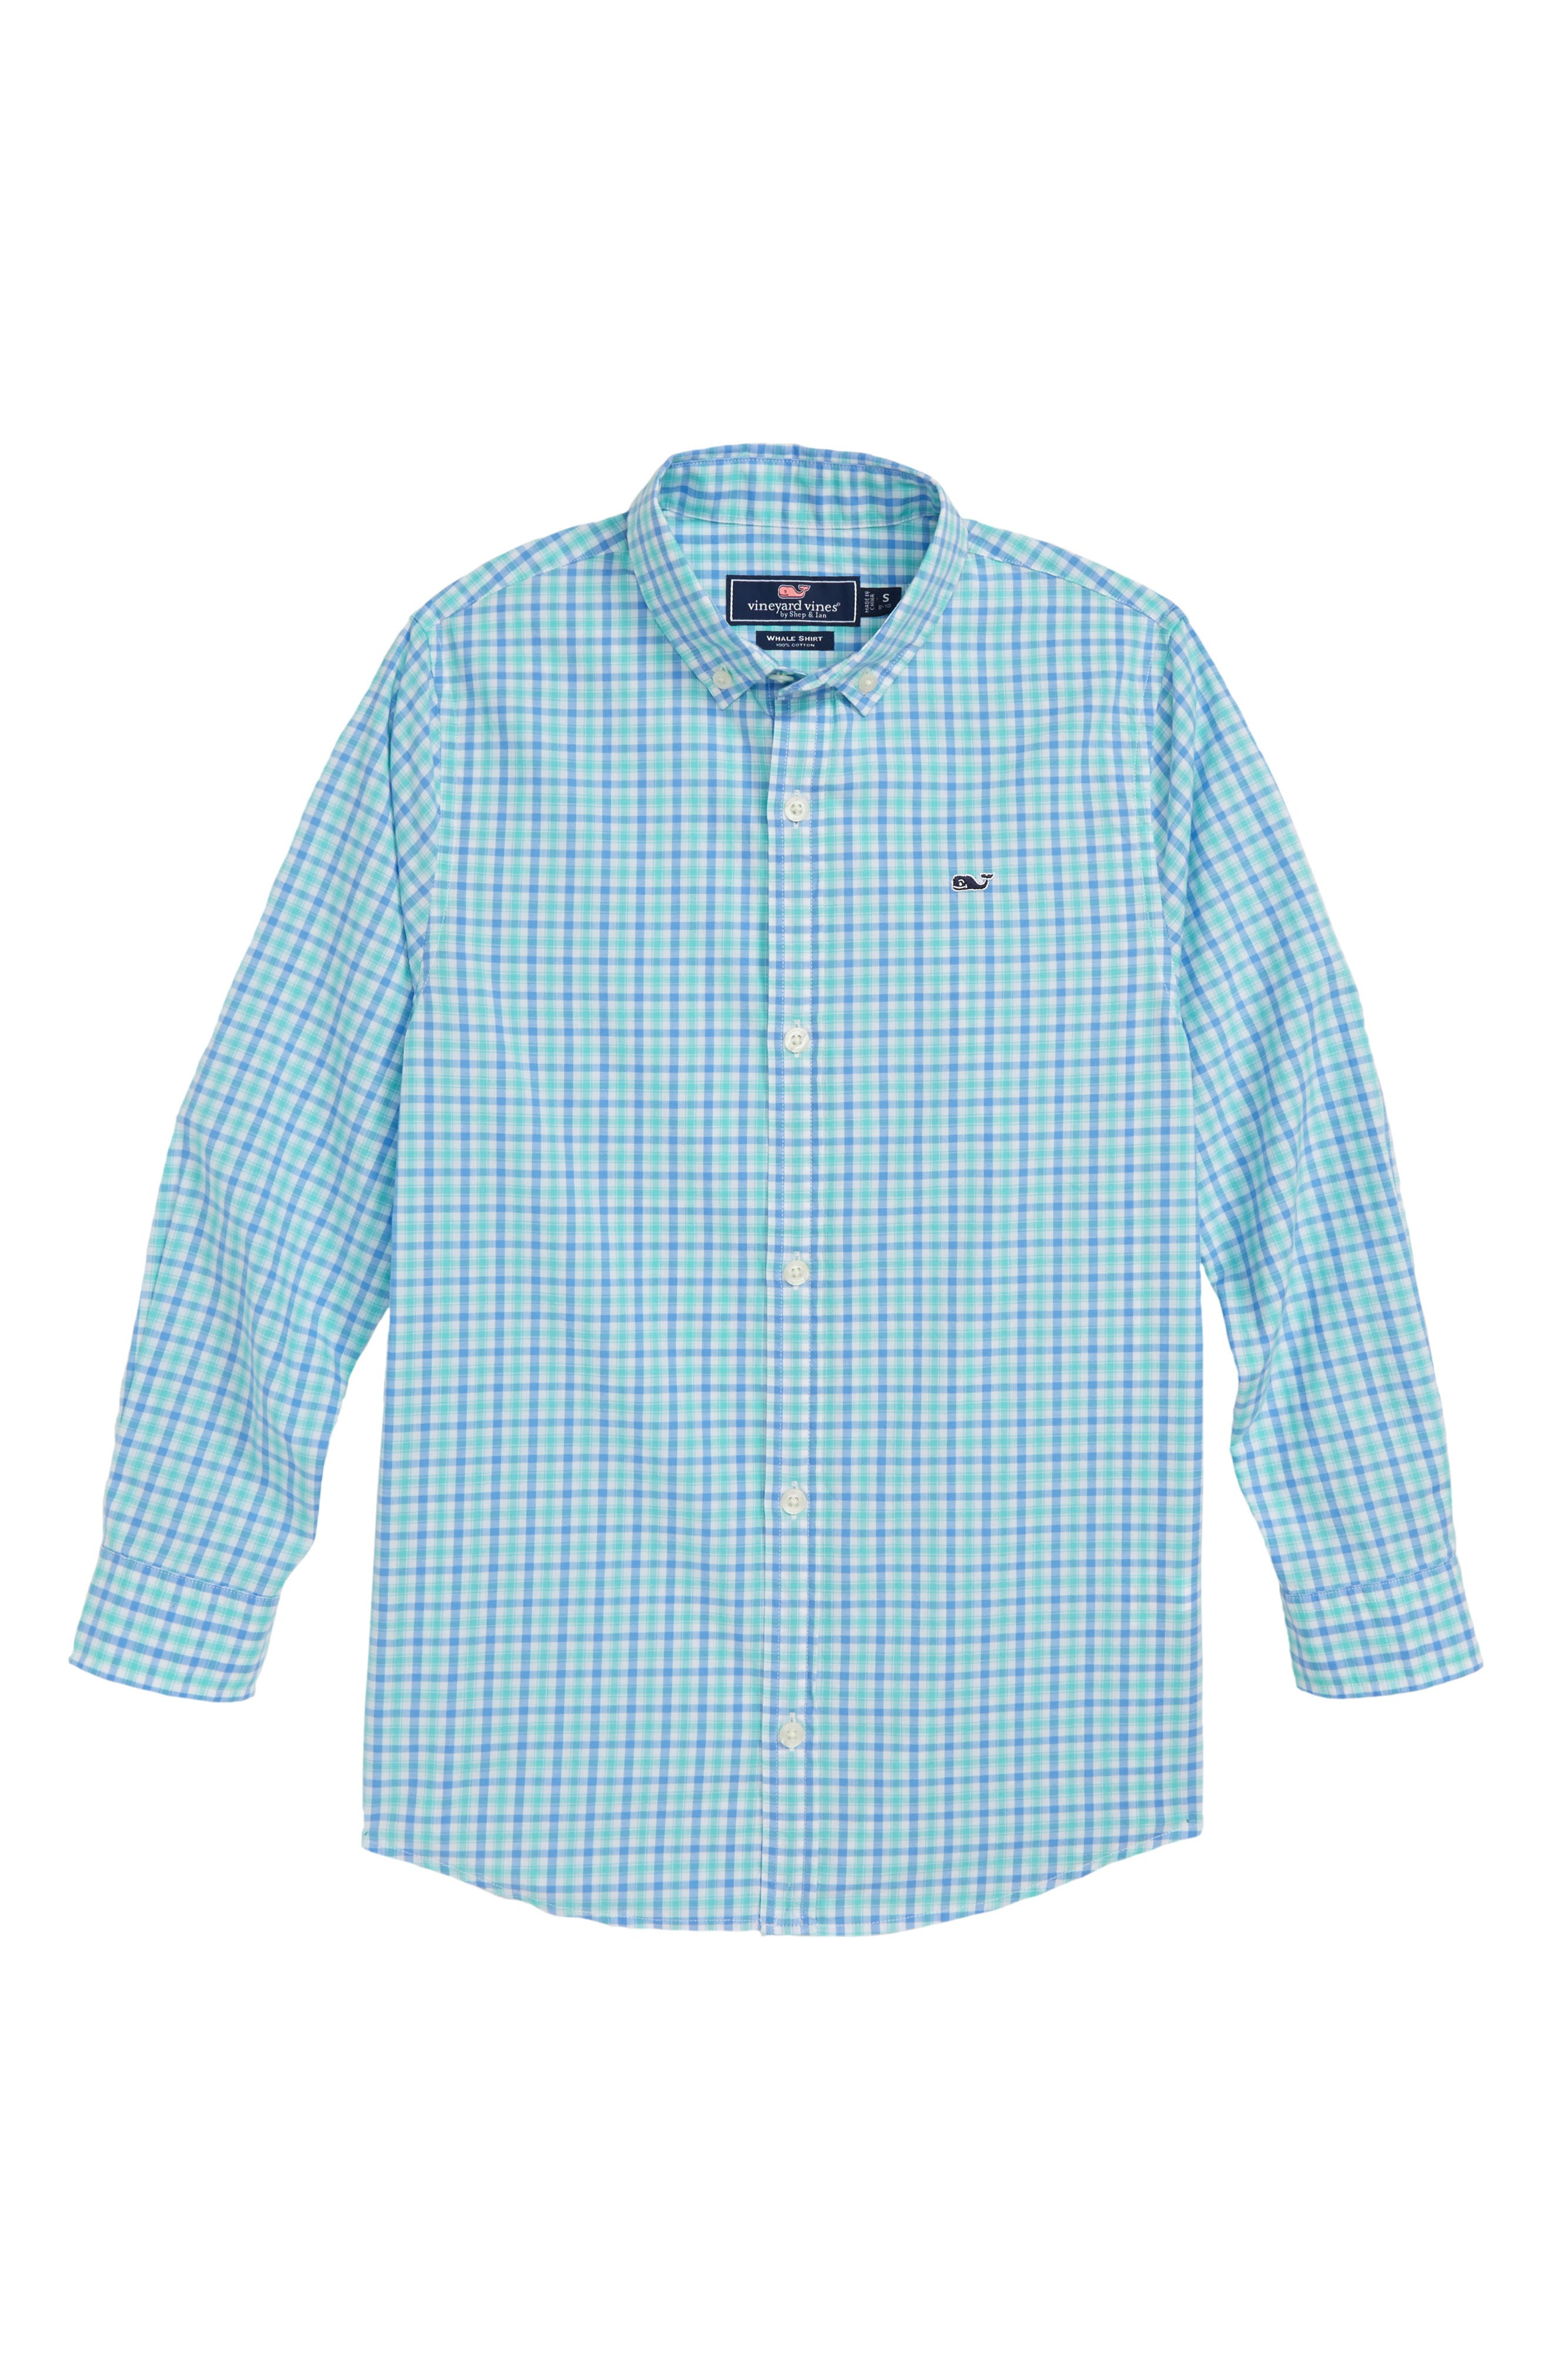 Poplin Cotton Whale Shirt,                             Main thumbnail 1, color,                             CAPRI BLUE